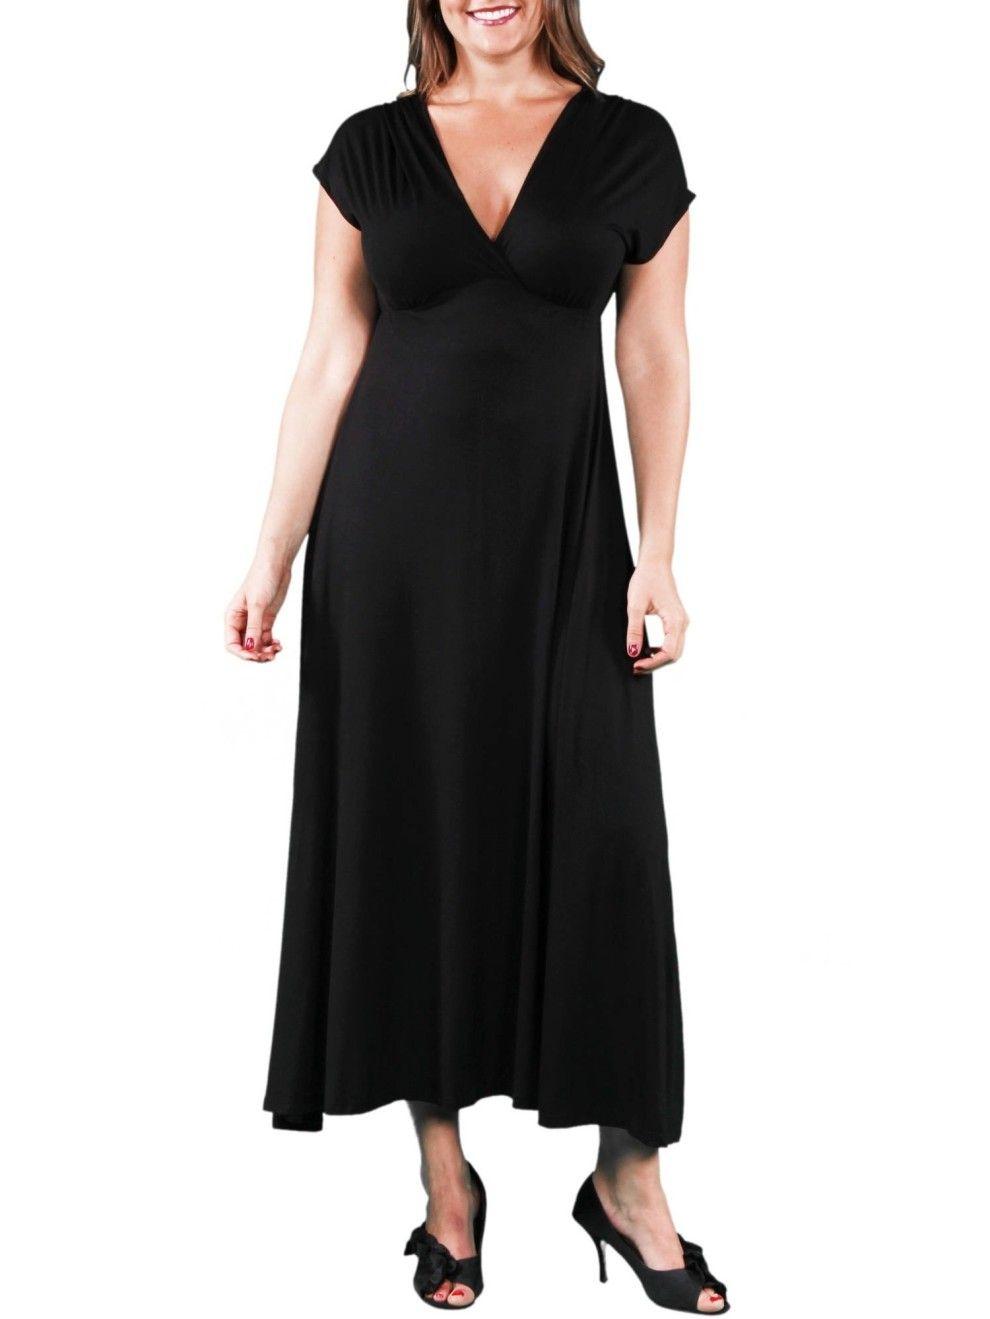 20 Dresses That Ll Have You Saying Okay Walmart I See You Maxi Dress Maxi Wrap Dress Plus Size Maxi Dresses [ 1319 x 990 Pixel ]